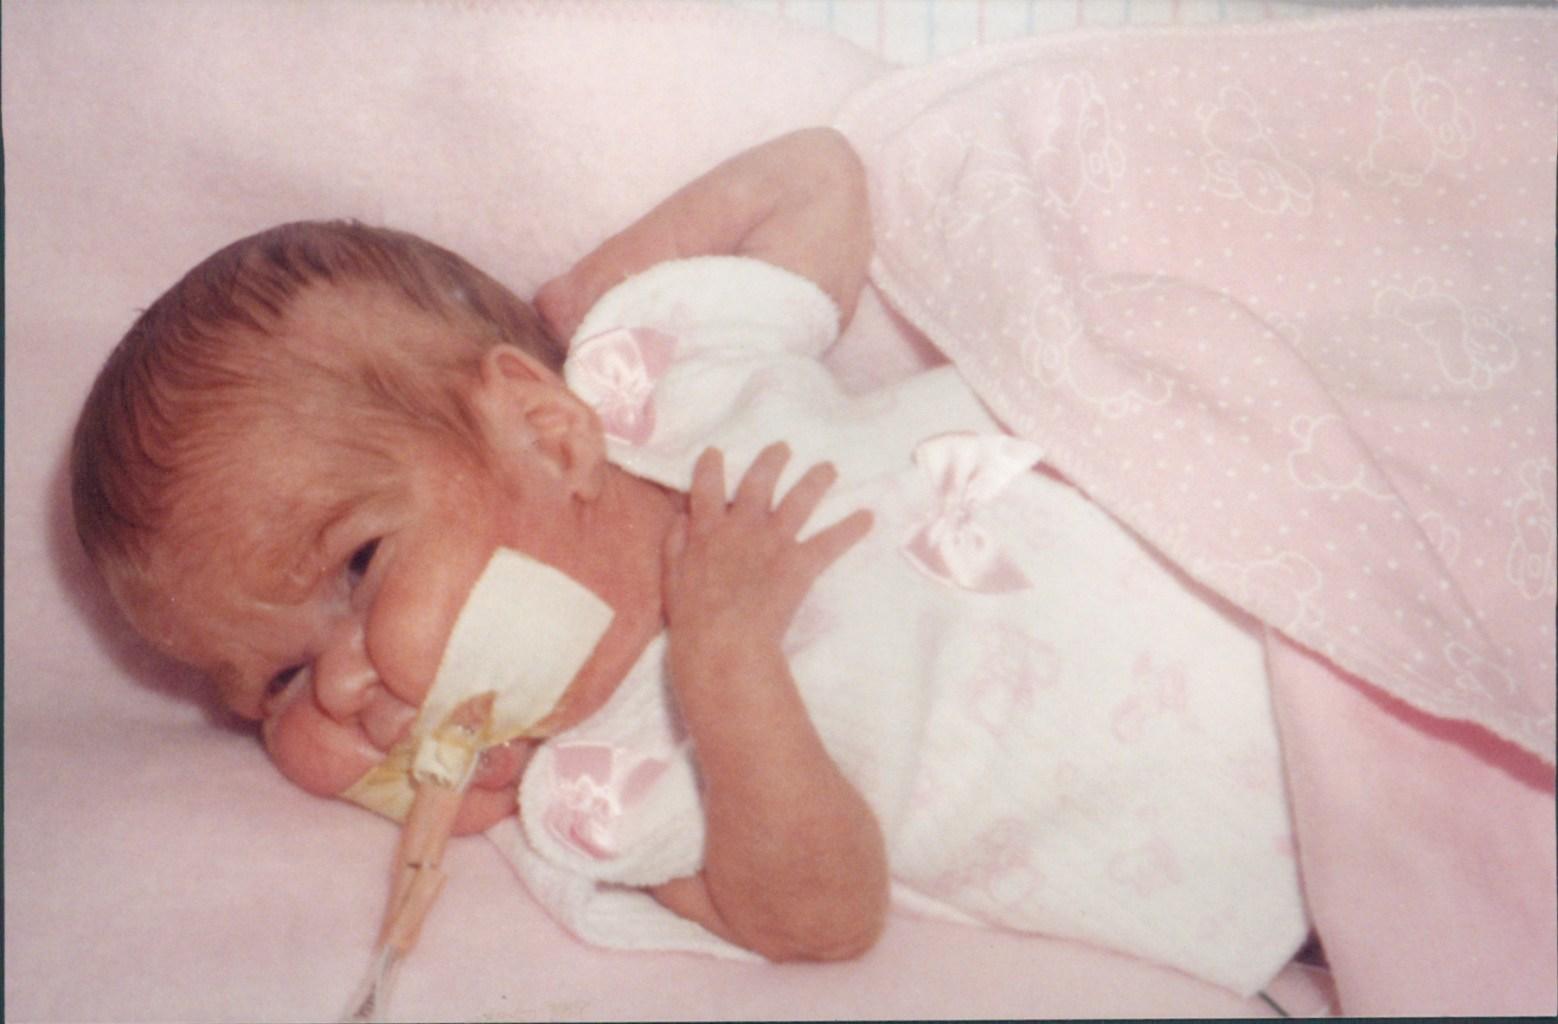 Image: Louisa wearing bows in the NICU